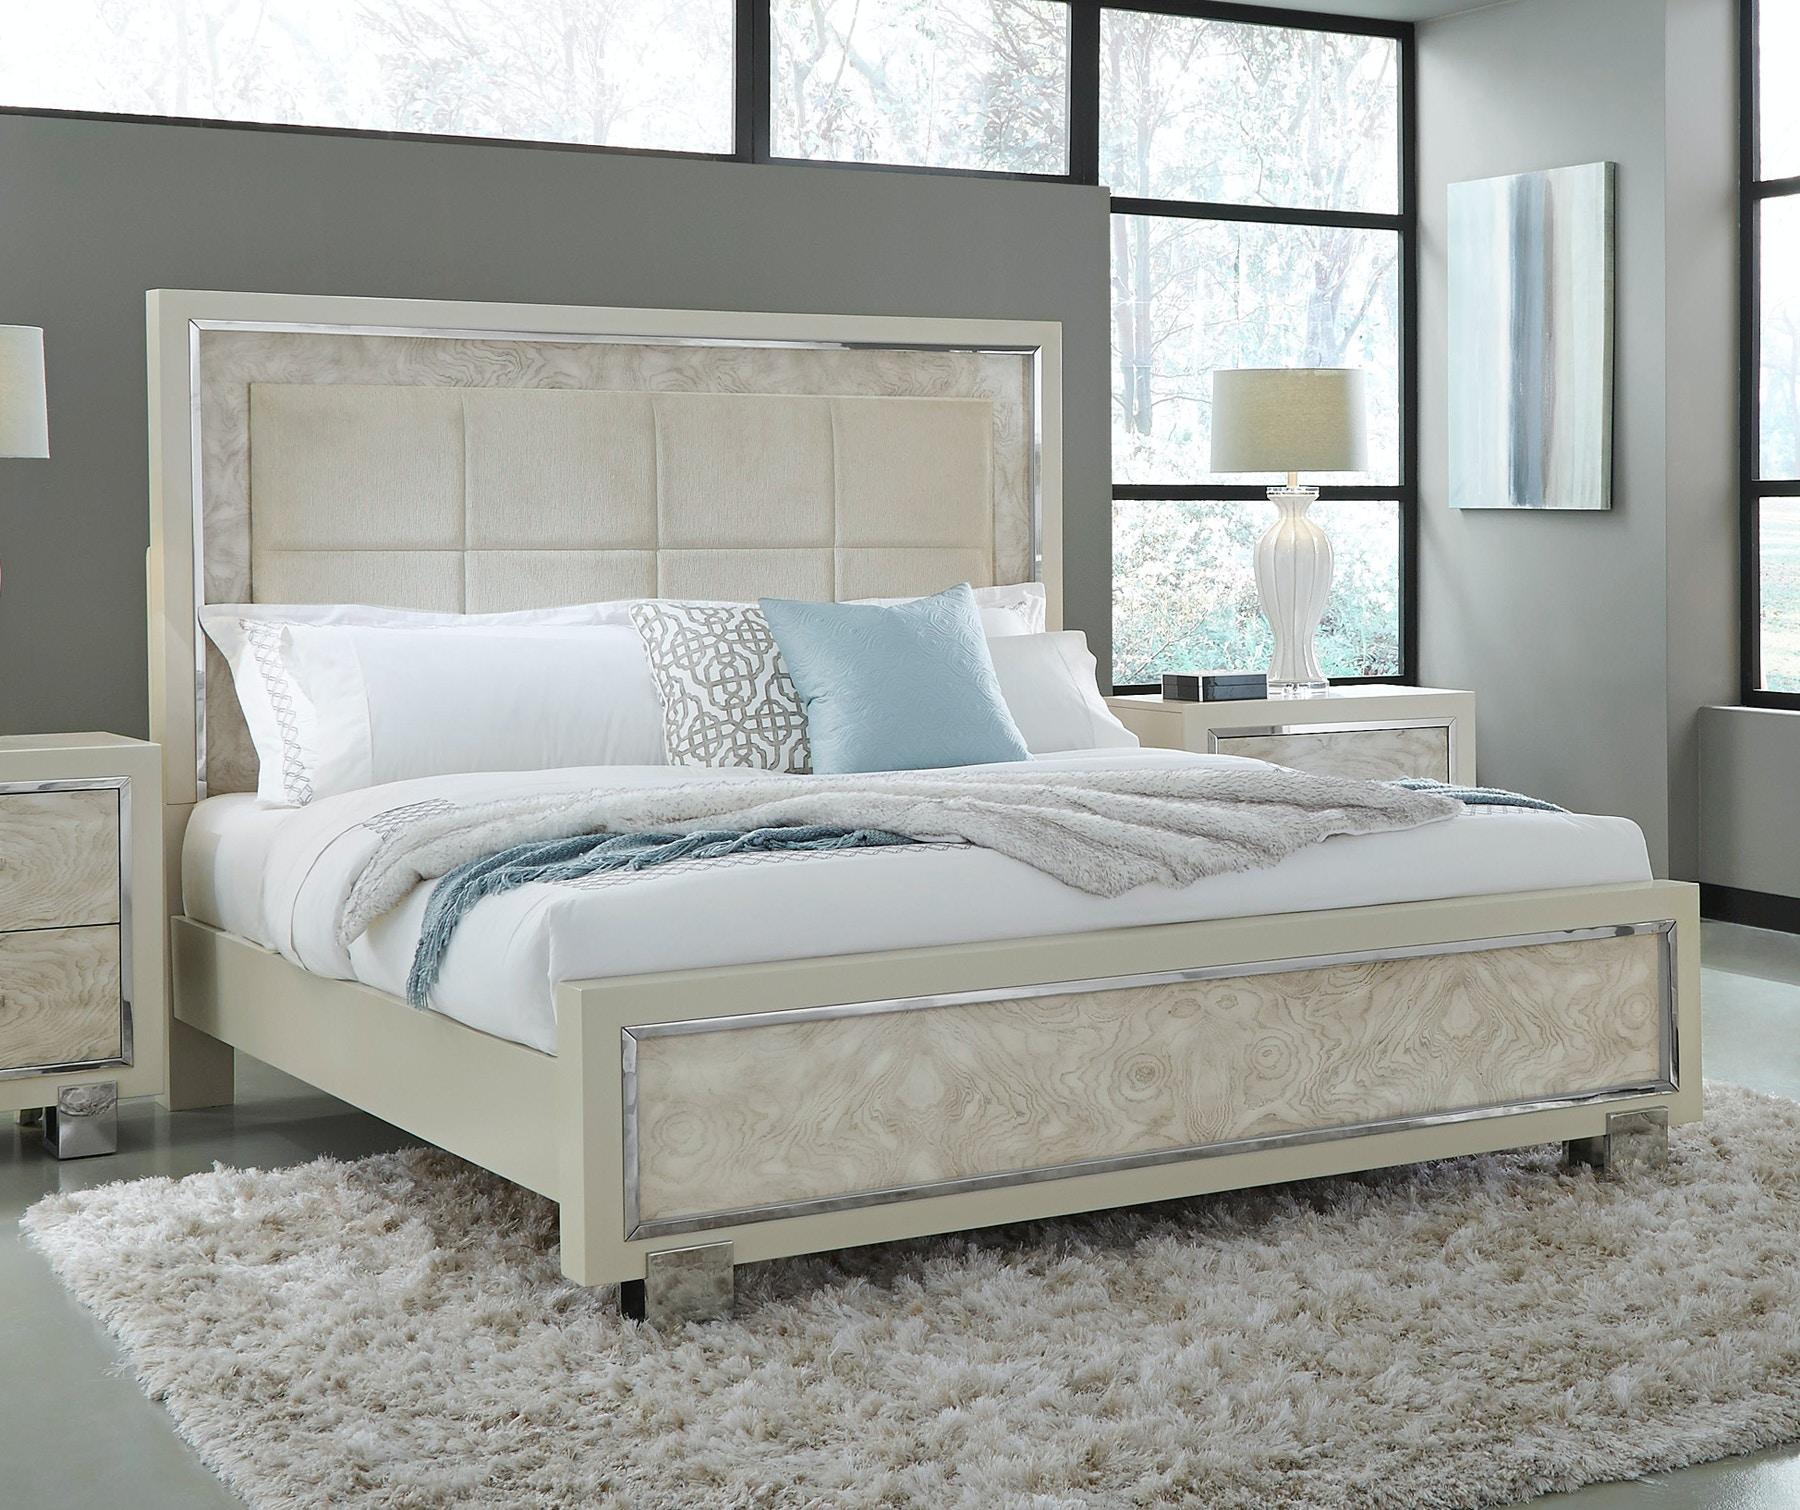 Pulaski Furniture Cydney Bed   King 741658